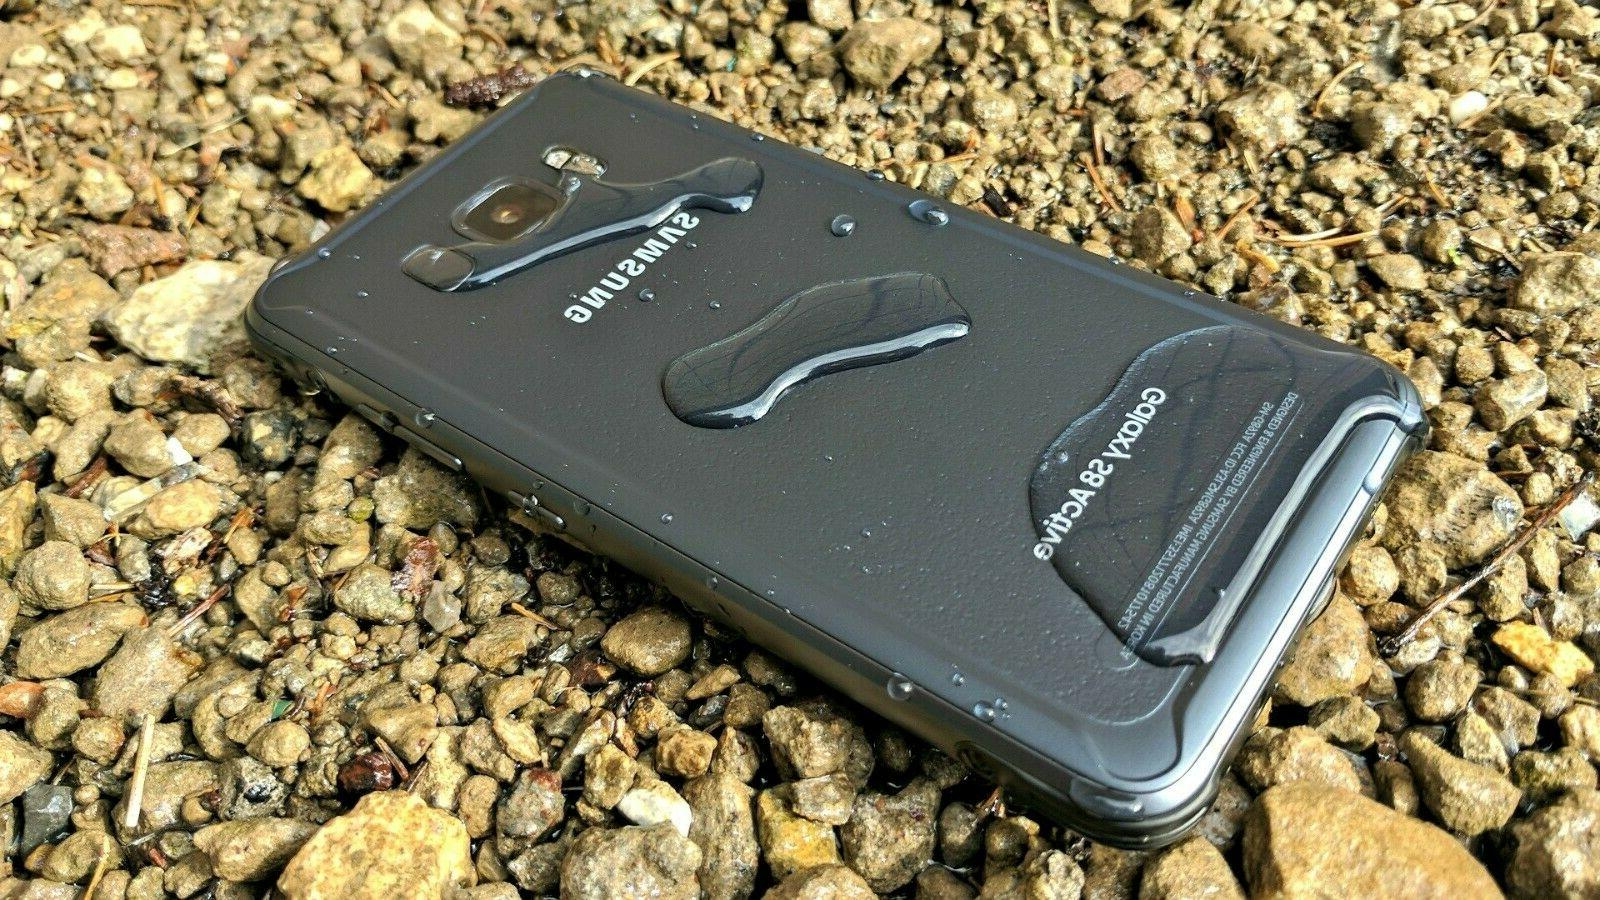 Samsung Galaxy G892A Smartphone